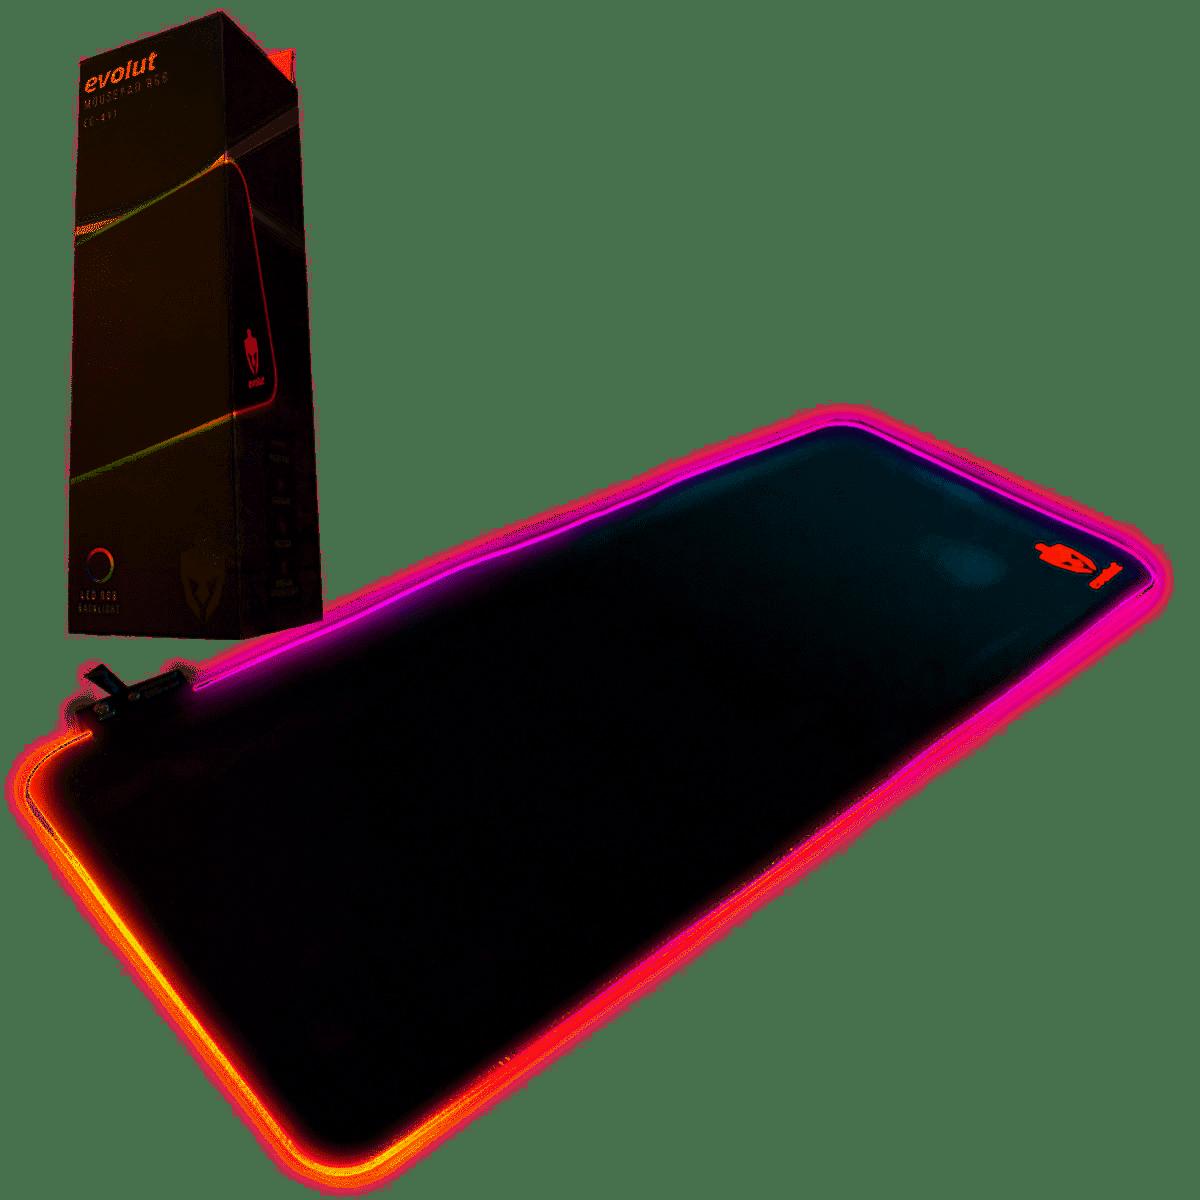 MOUSE PAD GAMER EVOLUT EG-411 LED RGB 700X300X3MM